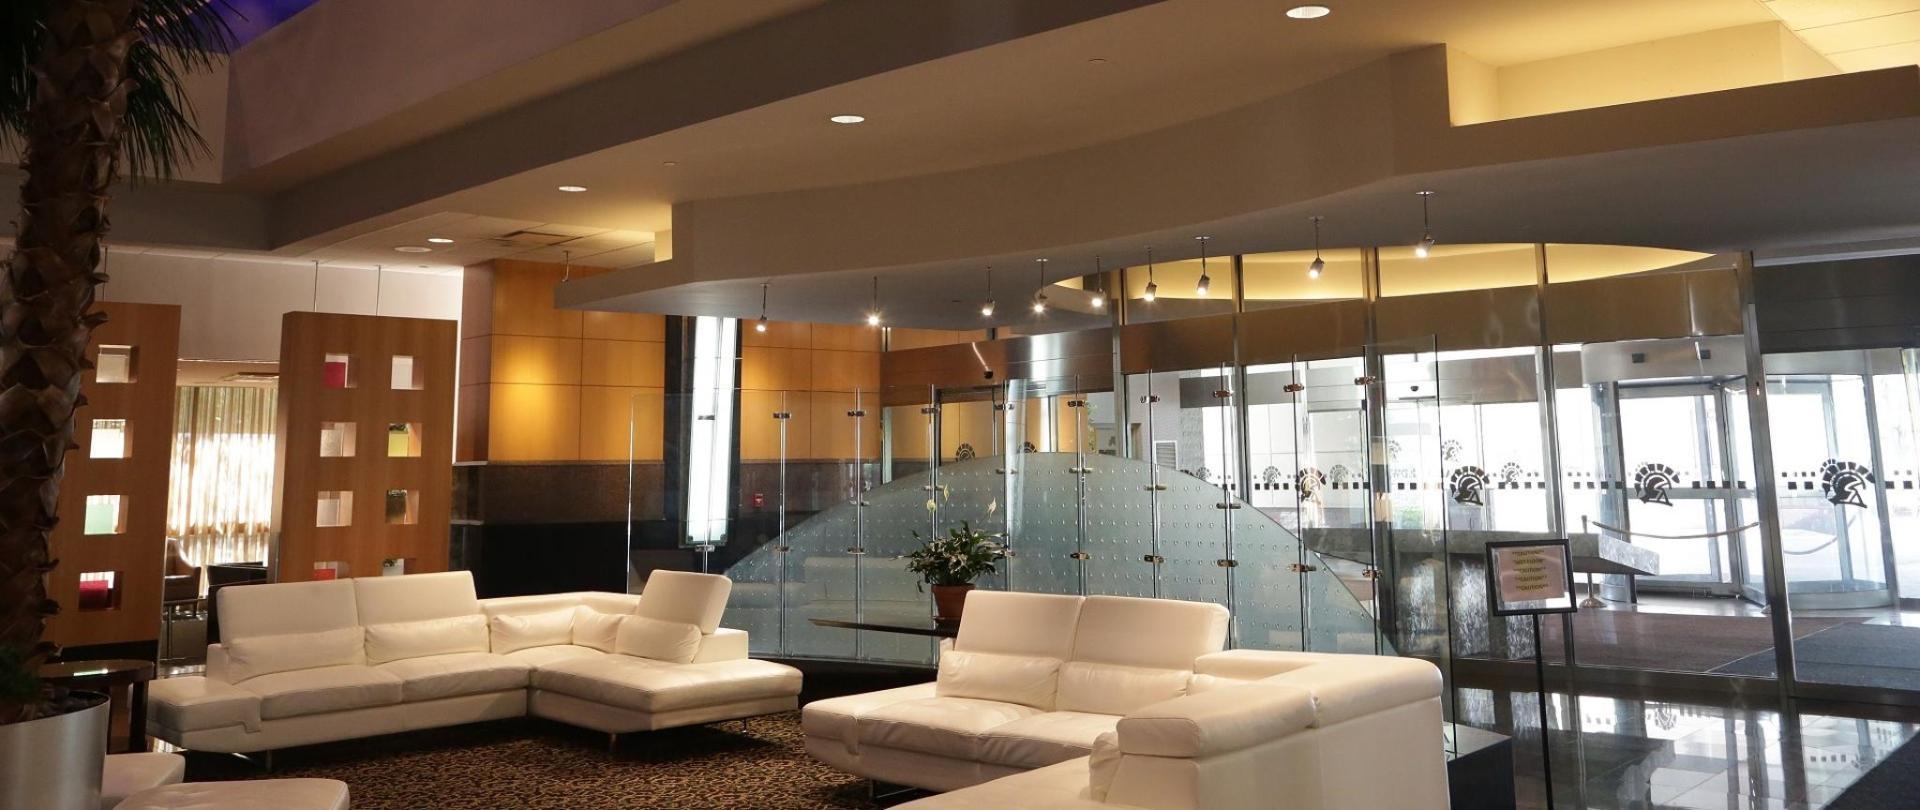 bright lobby pic.jpg